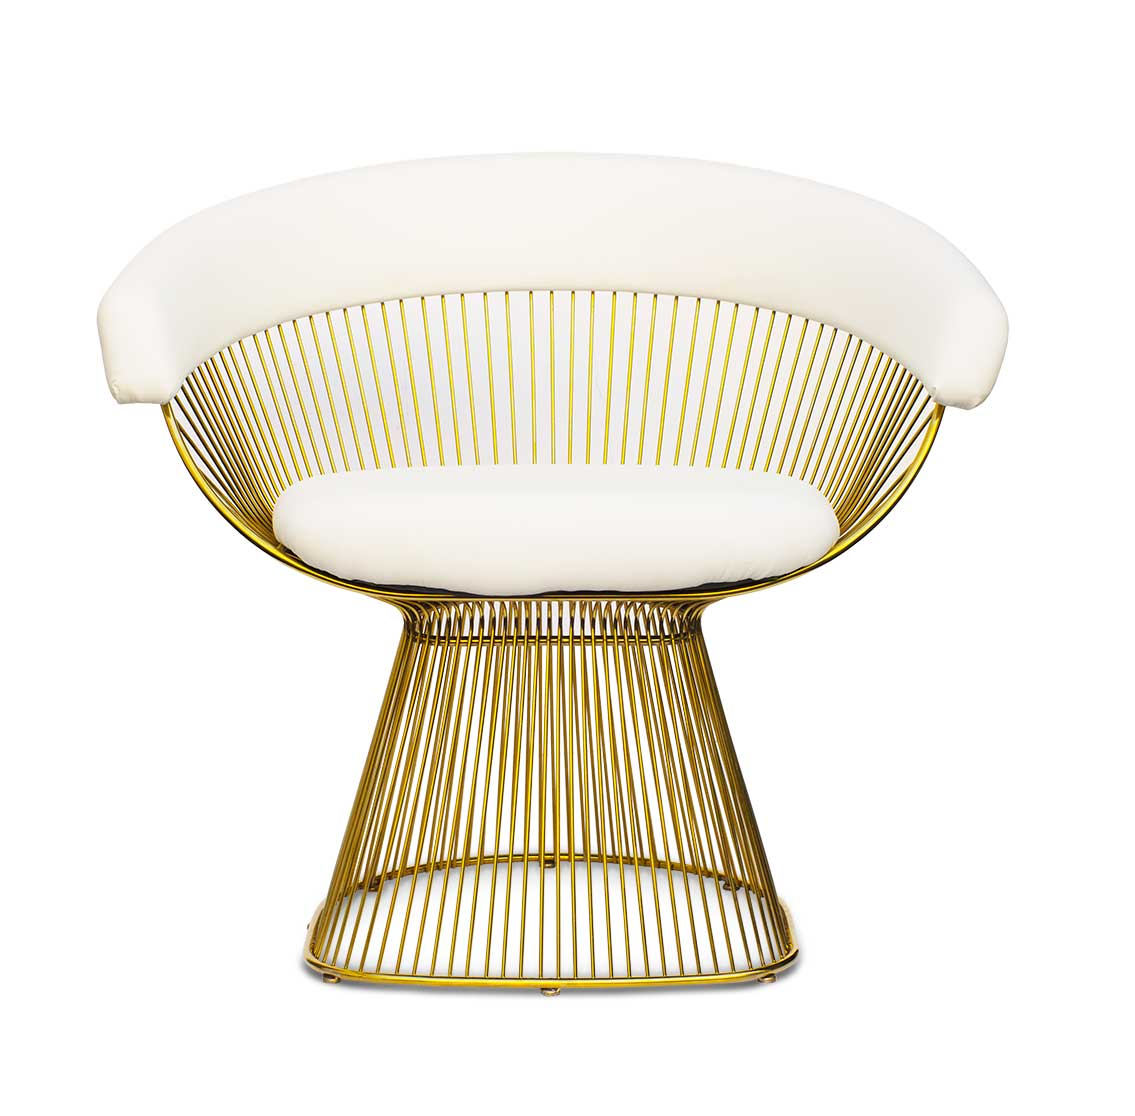 steel chair gold rio high boy beach wire with white leather neuerraum